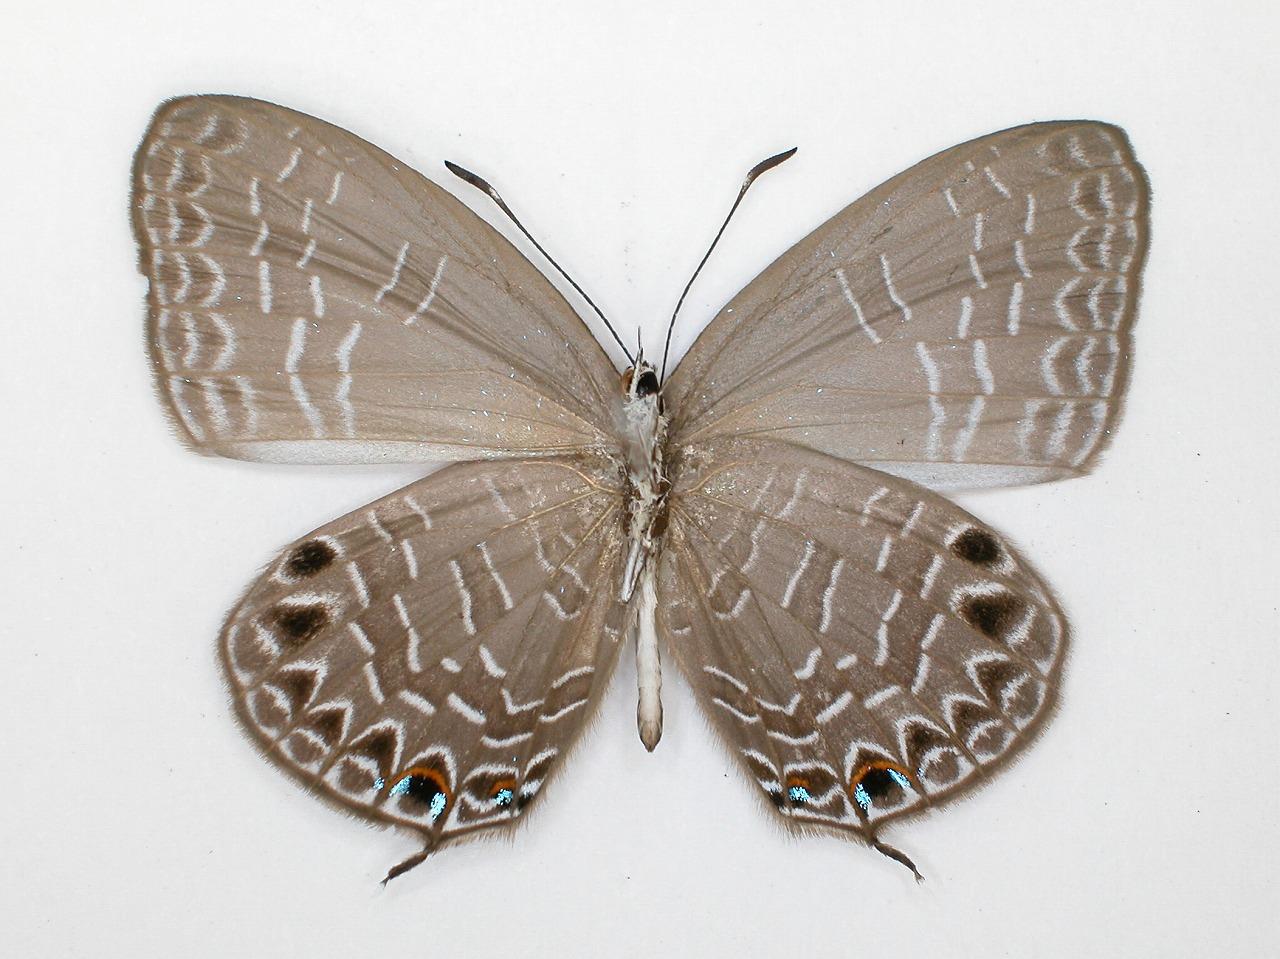 https://www.hitohaku.jp/material/l-material/butterfly-wing/5-lycaenidae/B1-273500_B.jpg